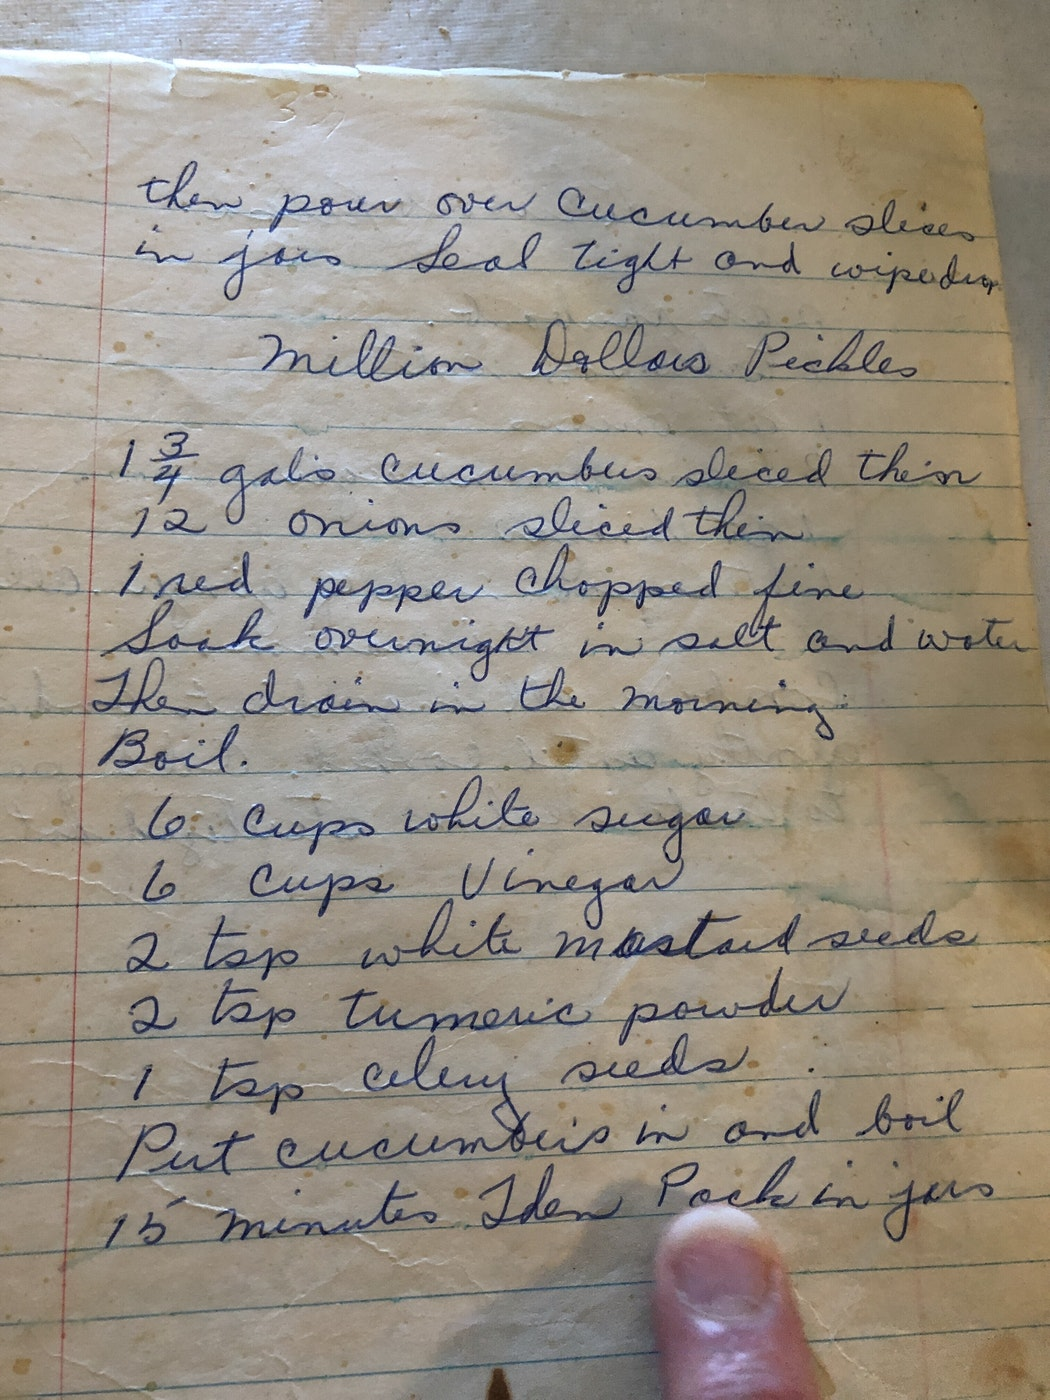 Sherry Heschuk's great grandmother's million-dollar pickle recipe